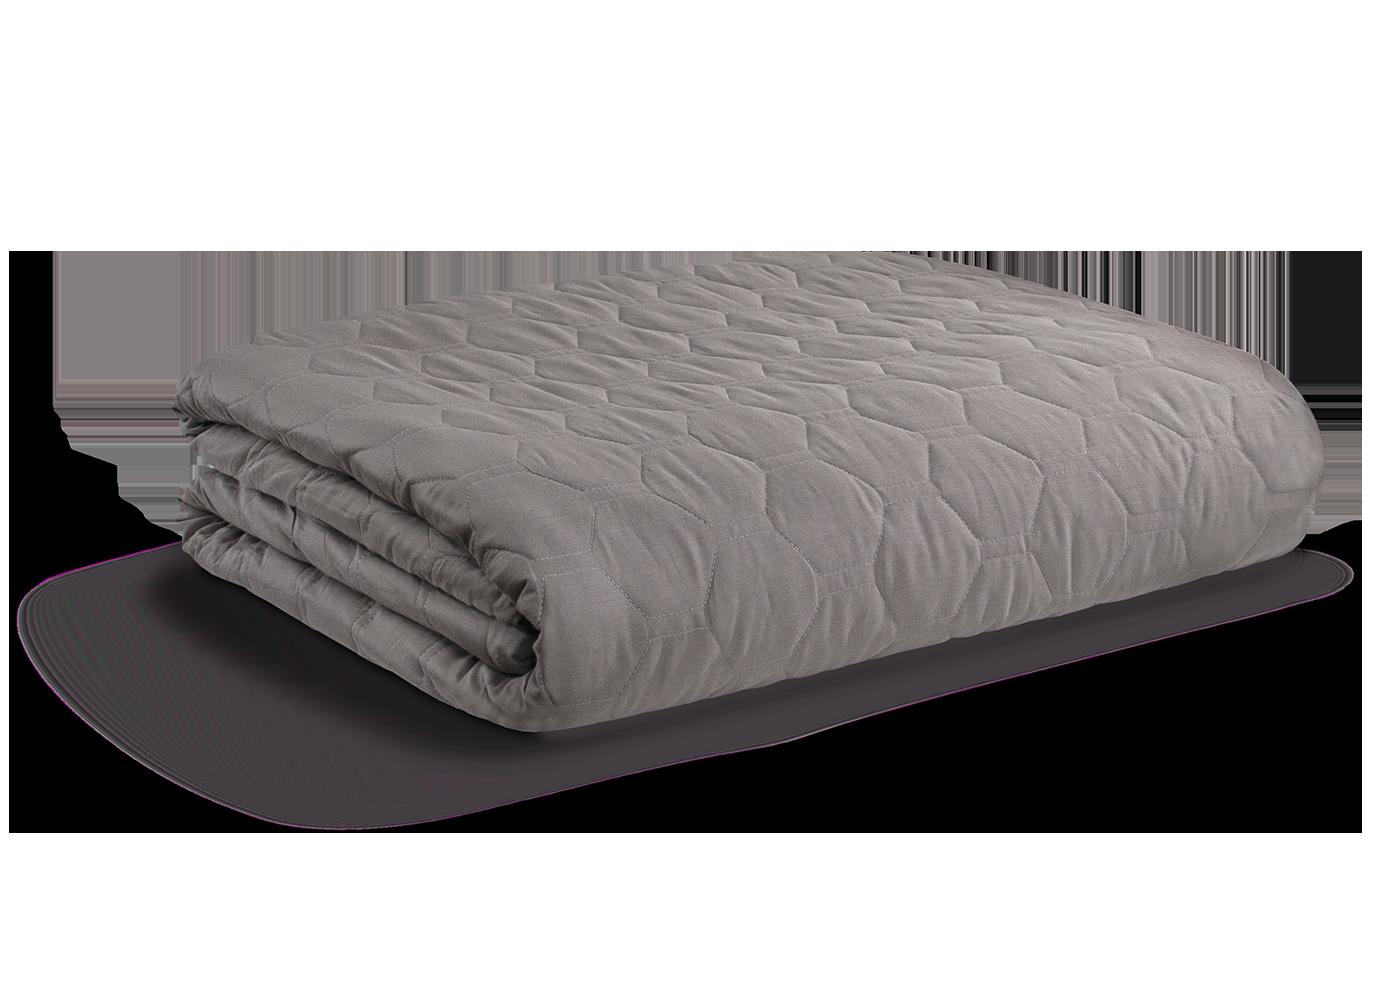 Hyper-Cotton Weighted Blanket